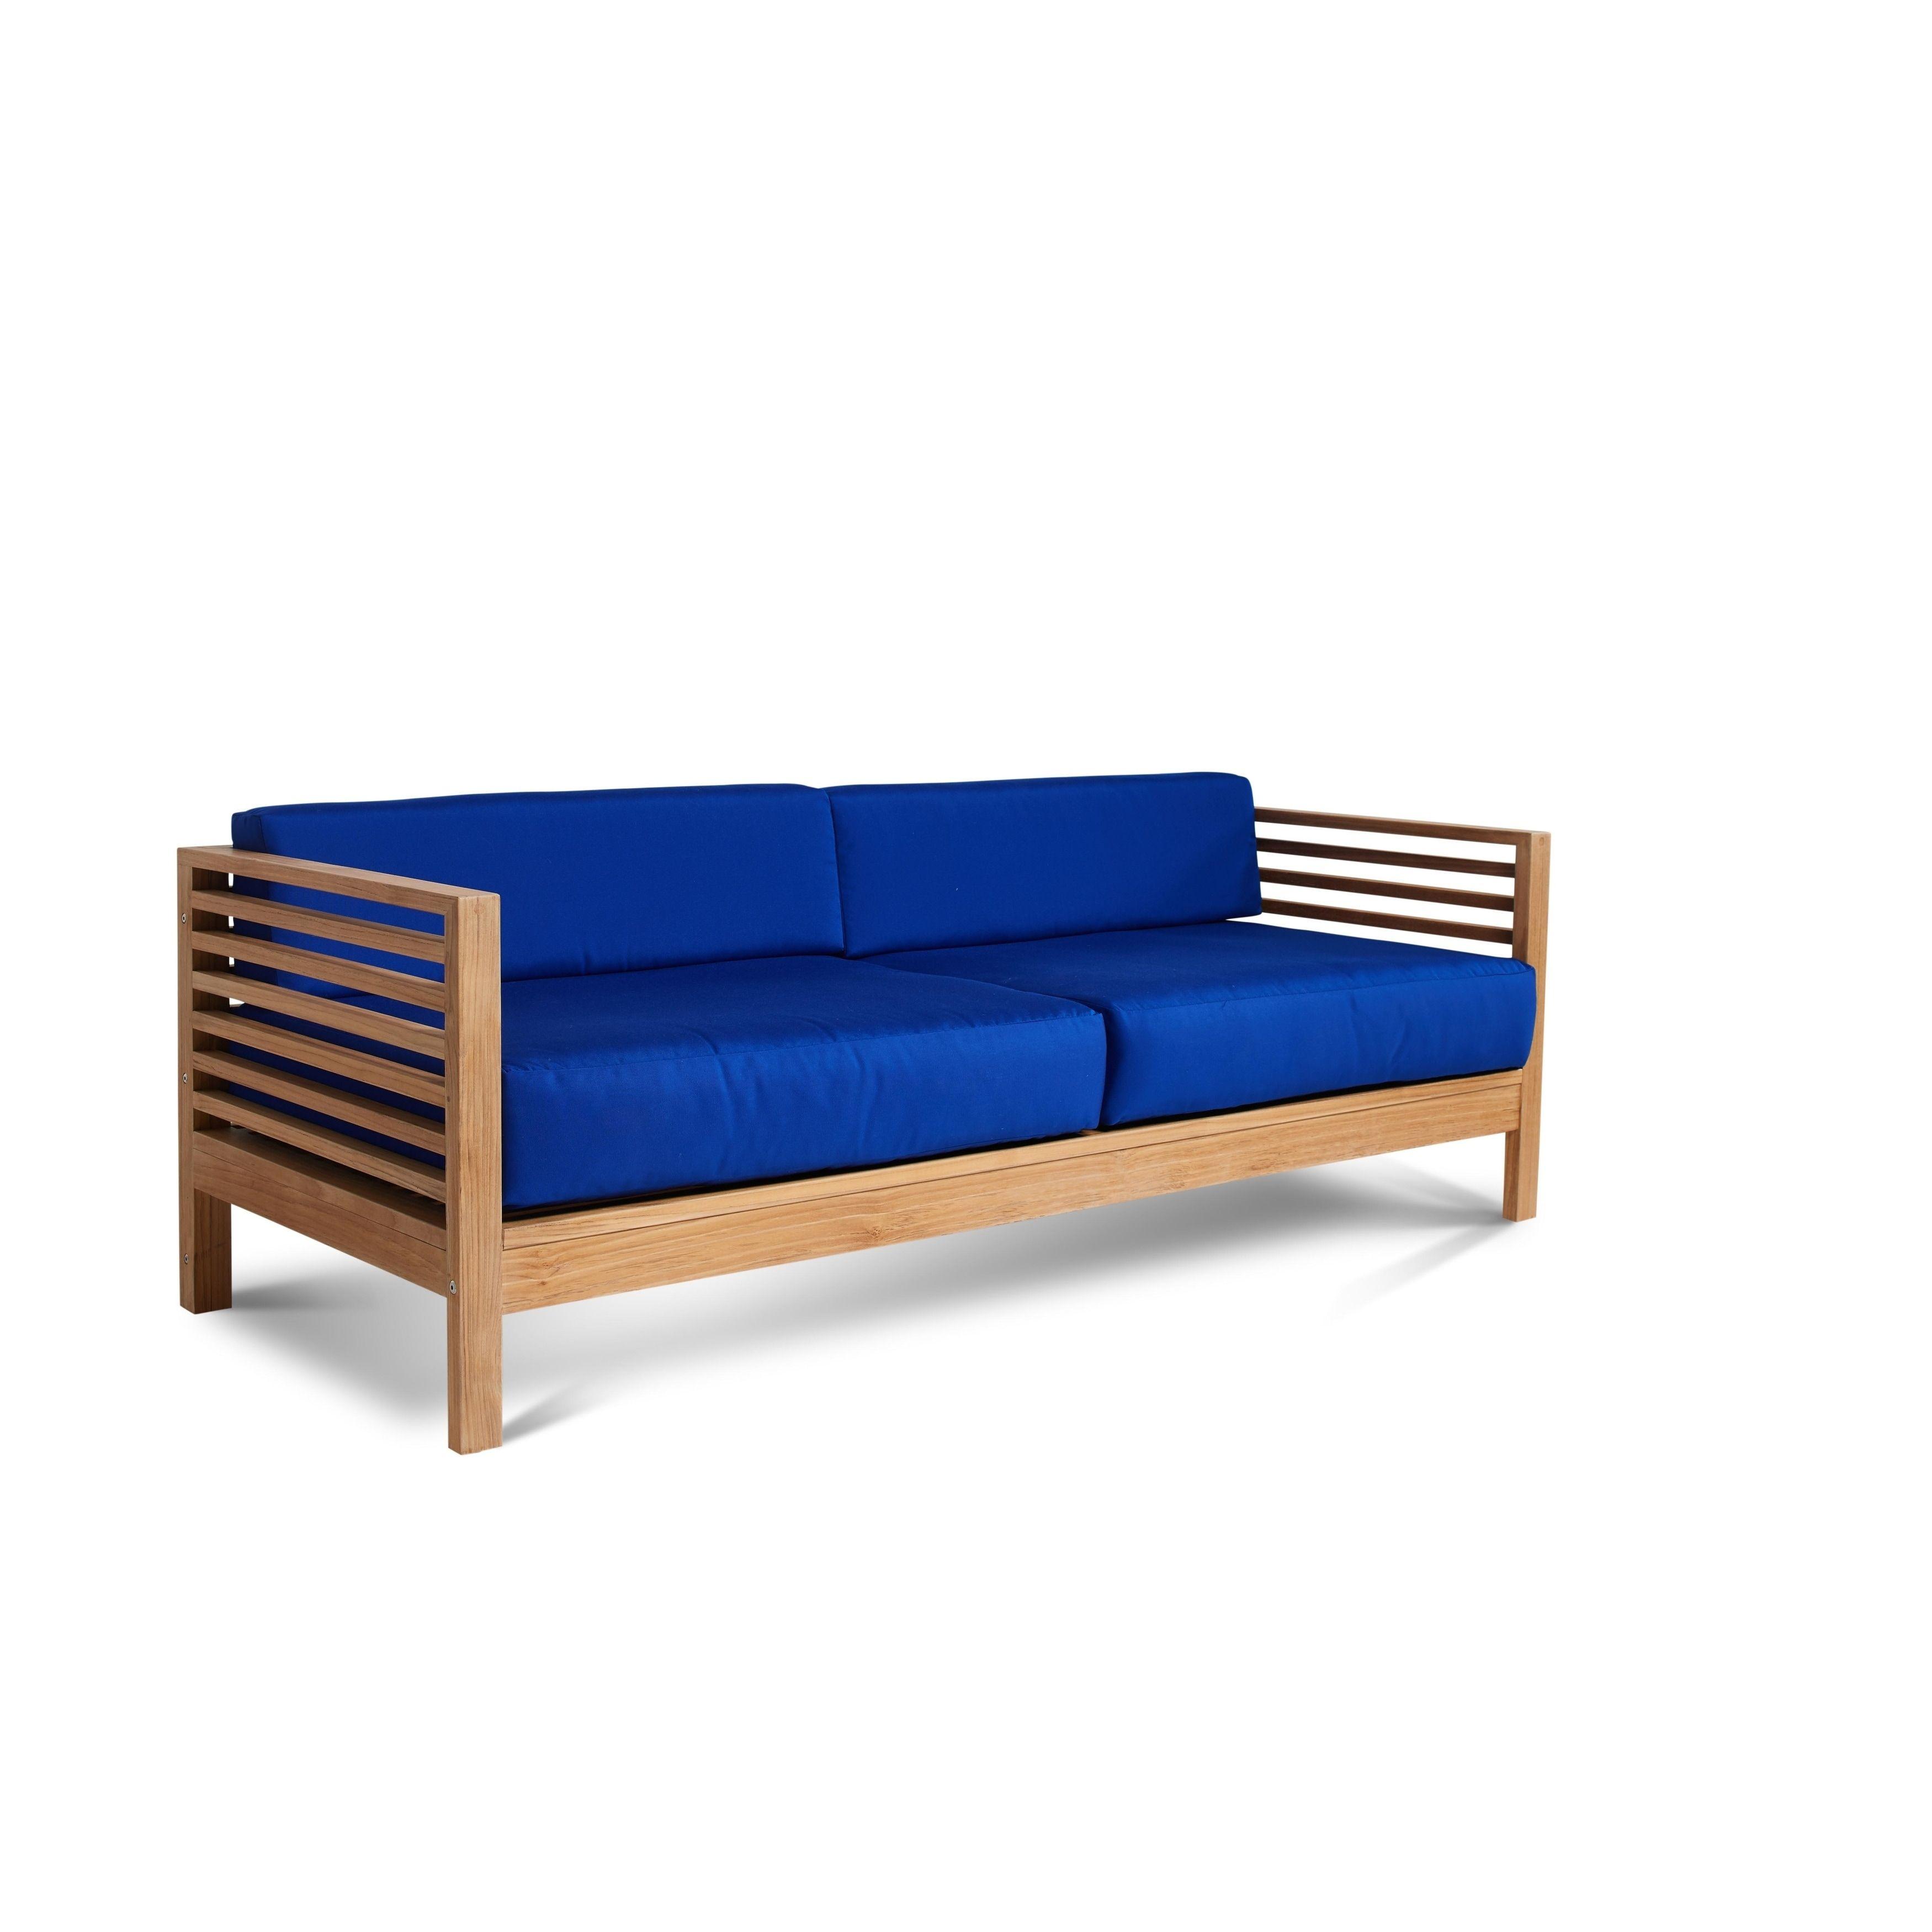 Summer Sofa Blue Teak Outdoor Seating Teak Patio Furniture Patio Sofa Patio Furniture Deals